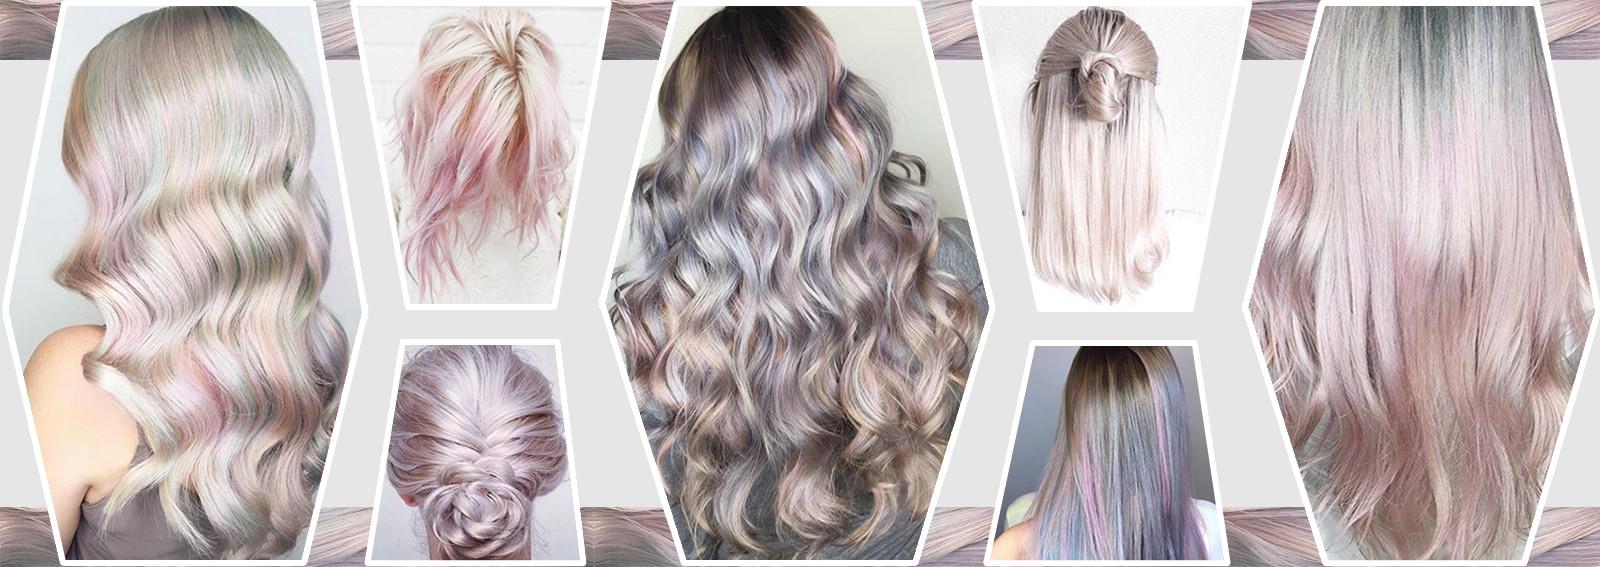 capelli pear hair tinta perlaperlata grigio lilla verde pastello cangiante collage_desktop